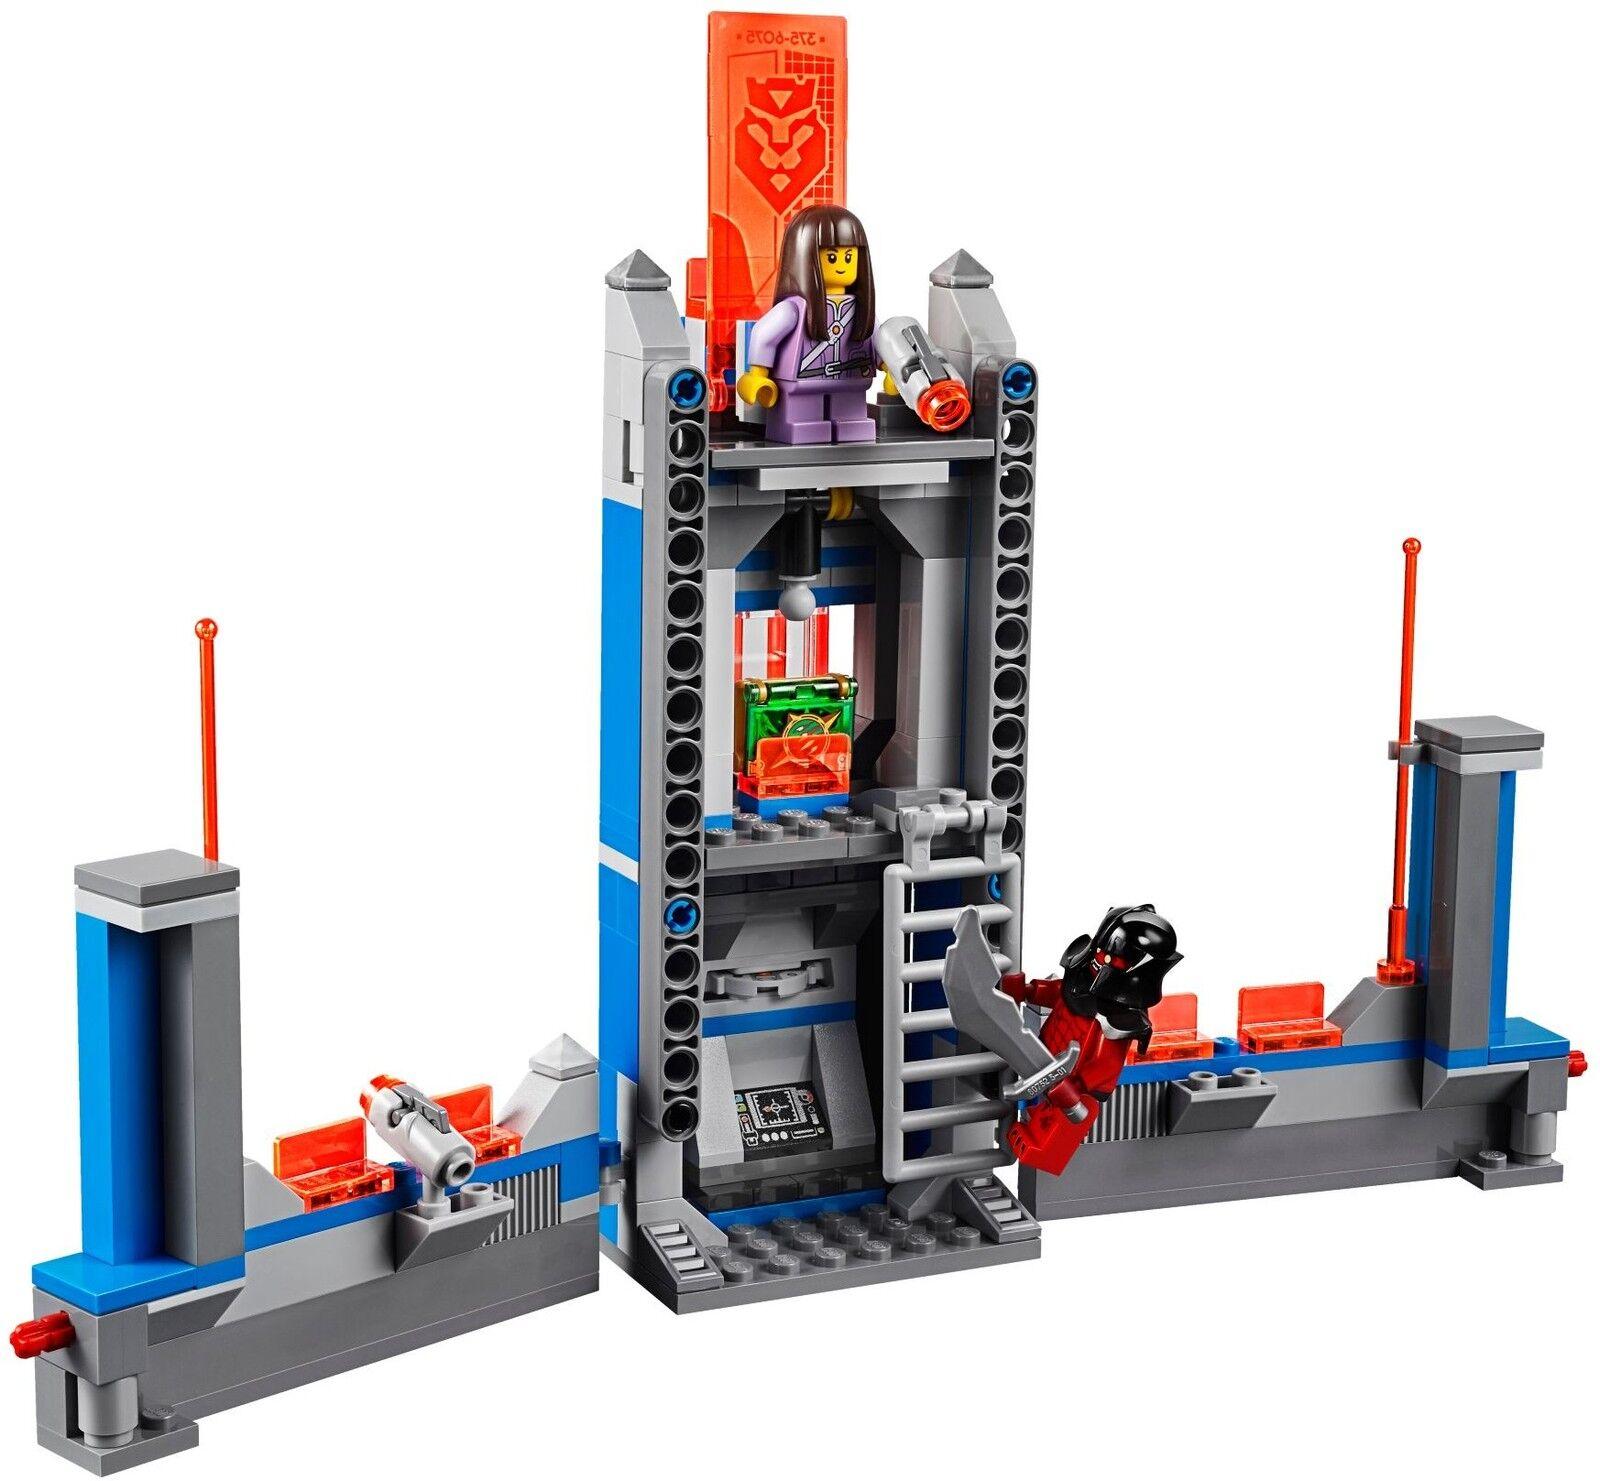 LEGO ® Nexo Knights ™ 70324 merlok's Bibliothèque Bibliothèque Bibliothèque 2.0 Nouveau neuf dans sa boîte _ merlok's Library 2.0 une 2bf9f9